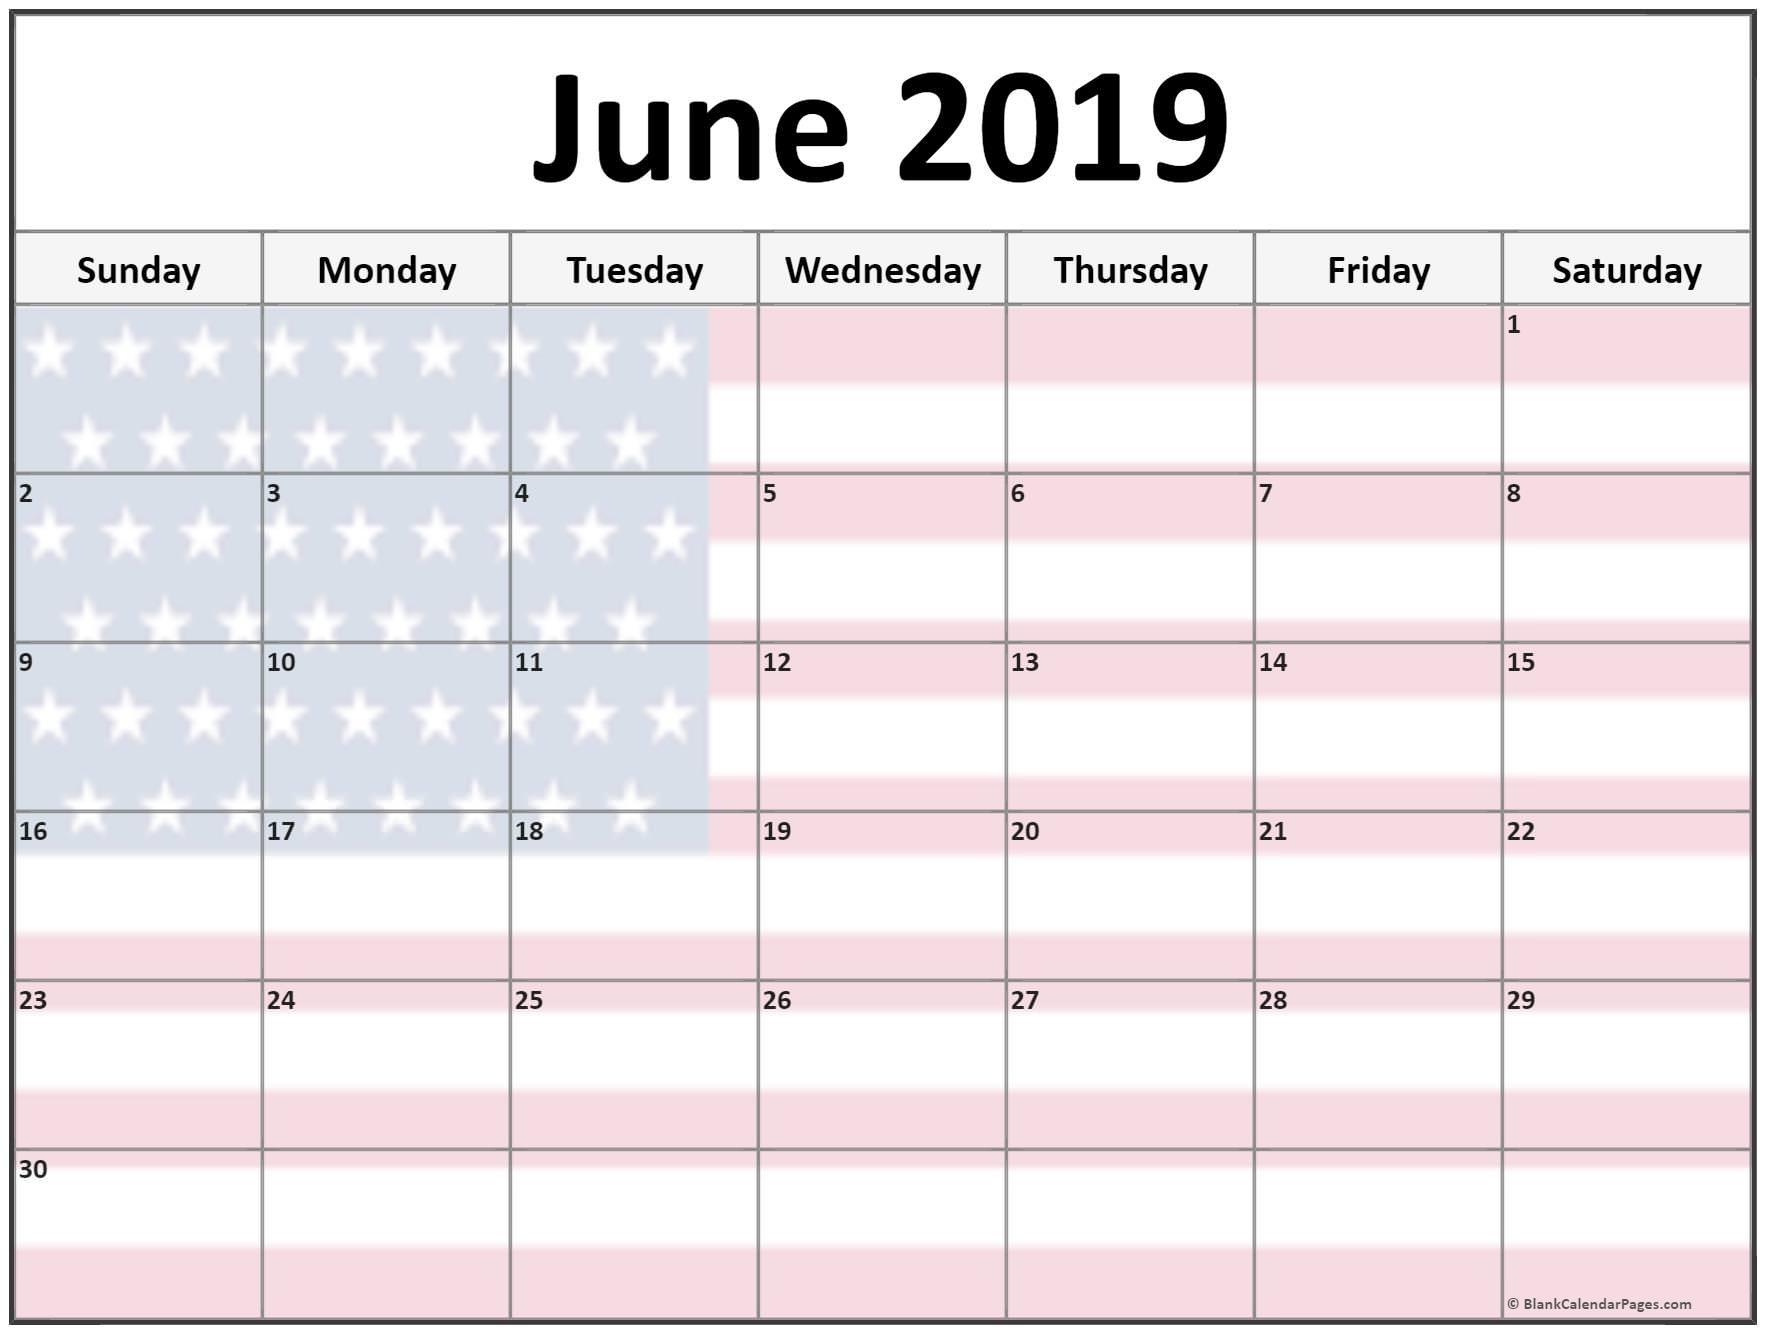 June 2019 US Calendar